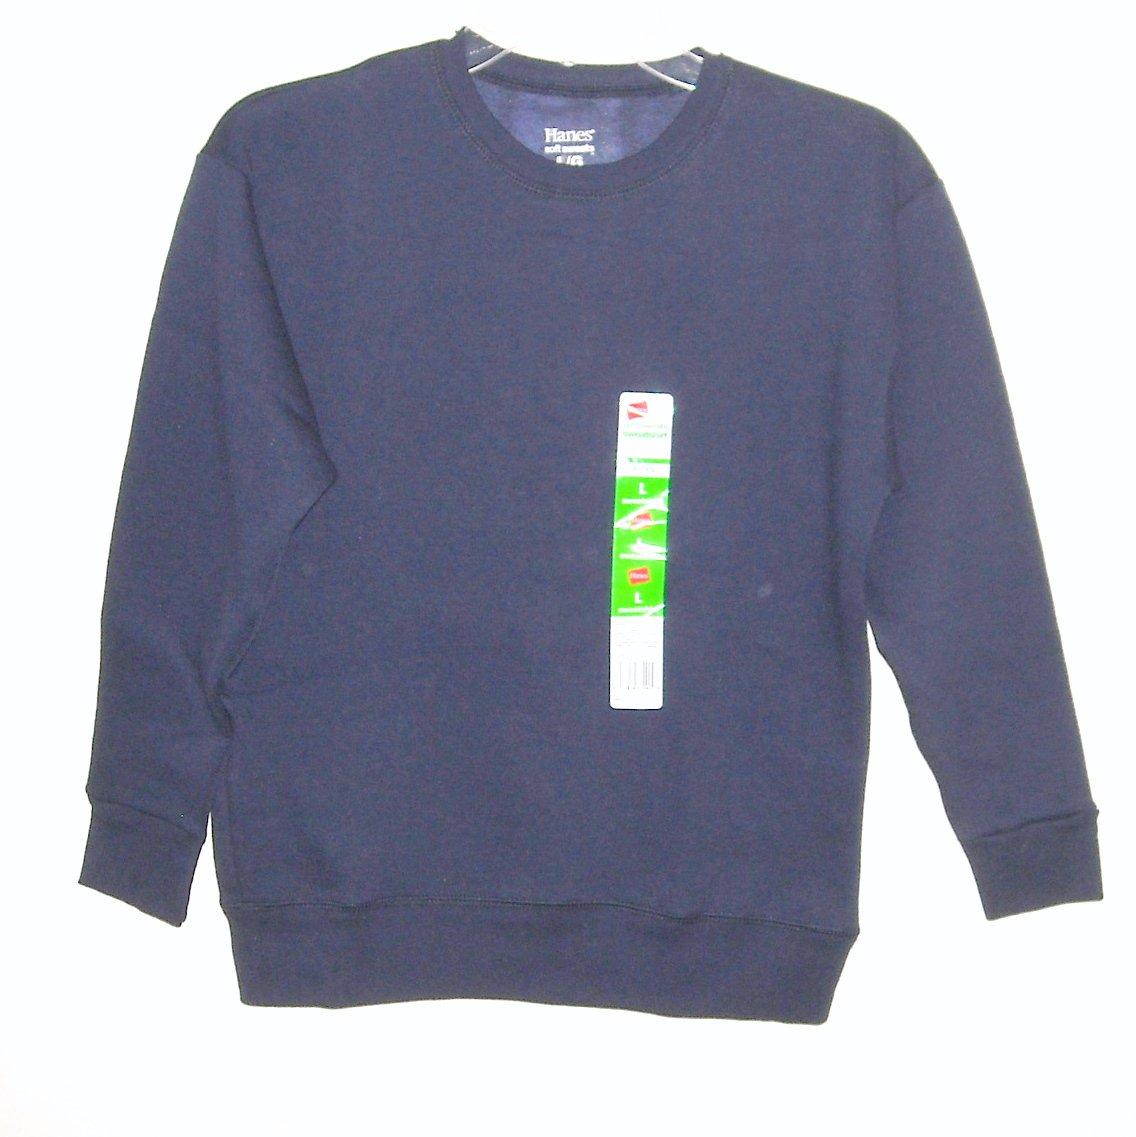 Hanes Boys Soft Navy Blue Sweats Fleece Sweatshirt L / G 10/12